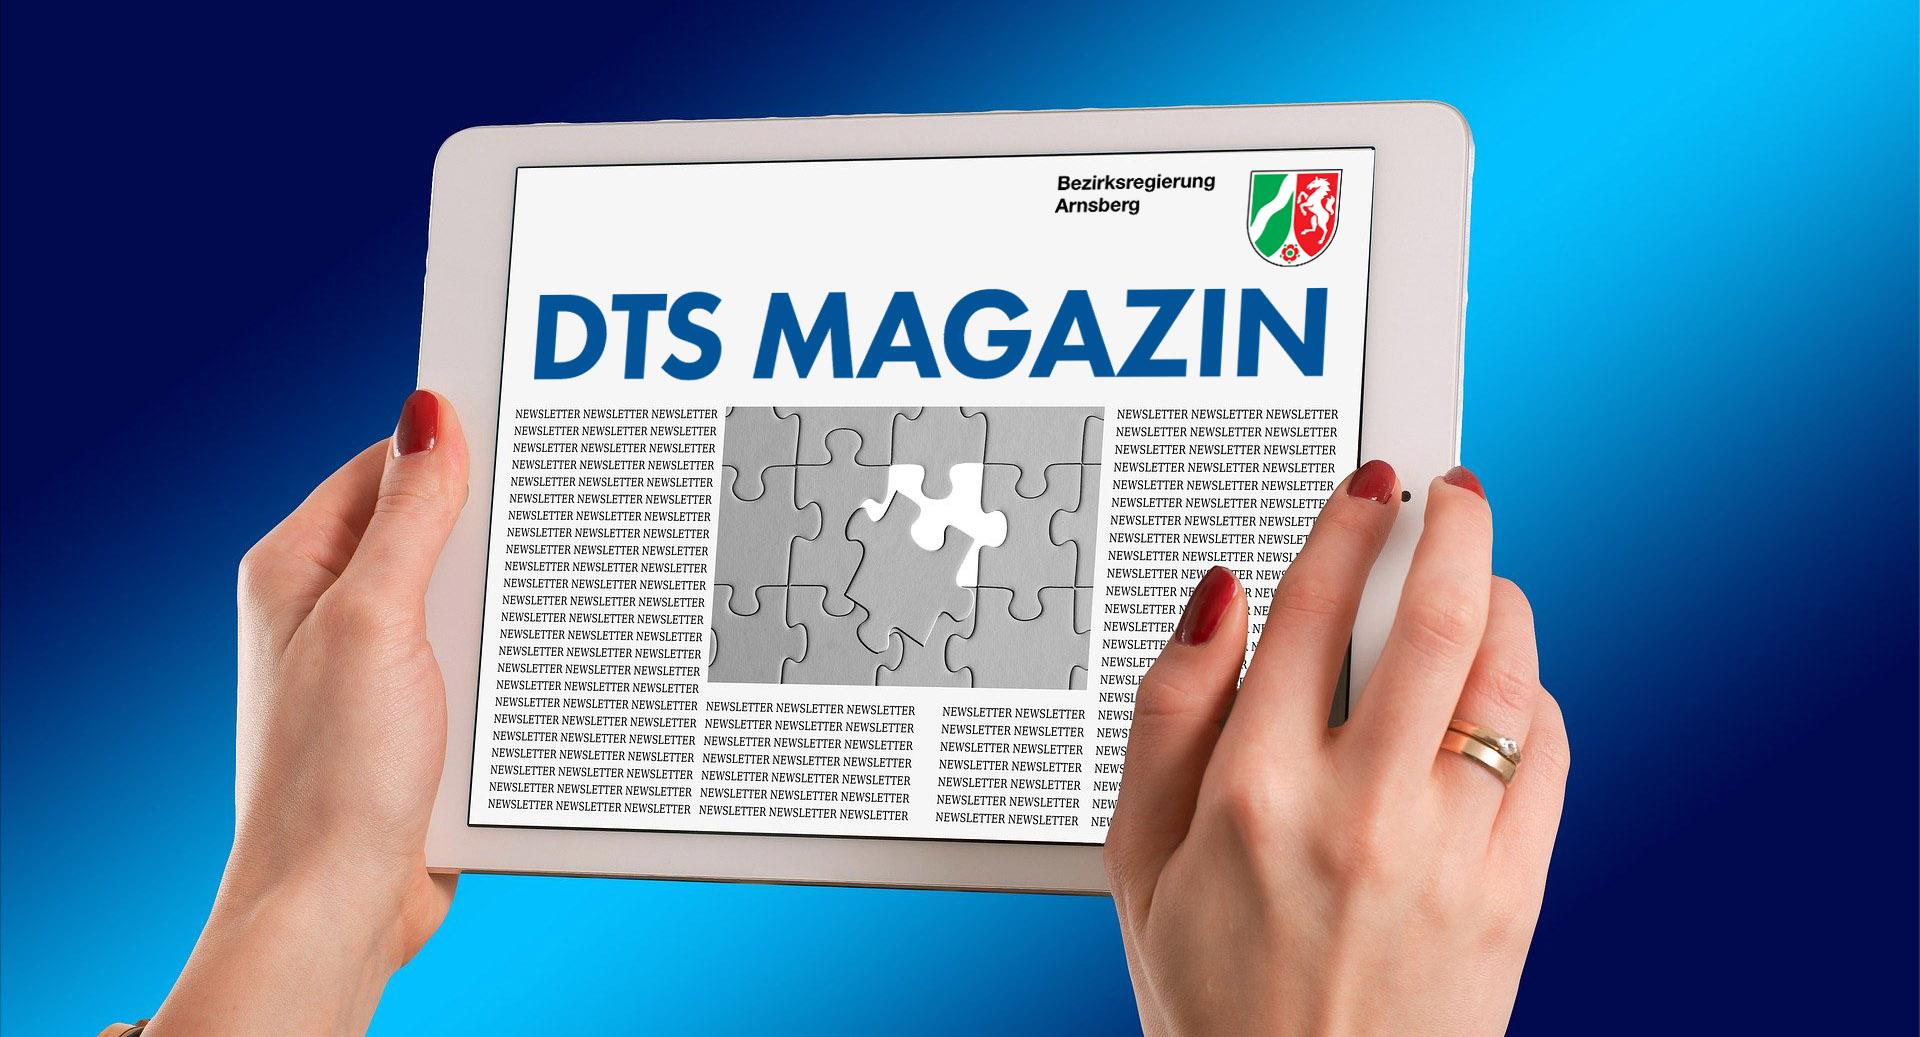 DTS Magazin